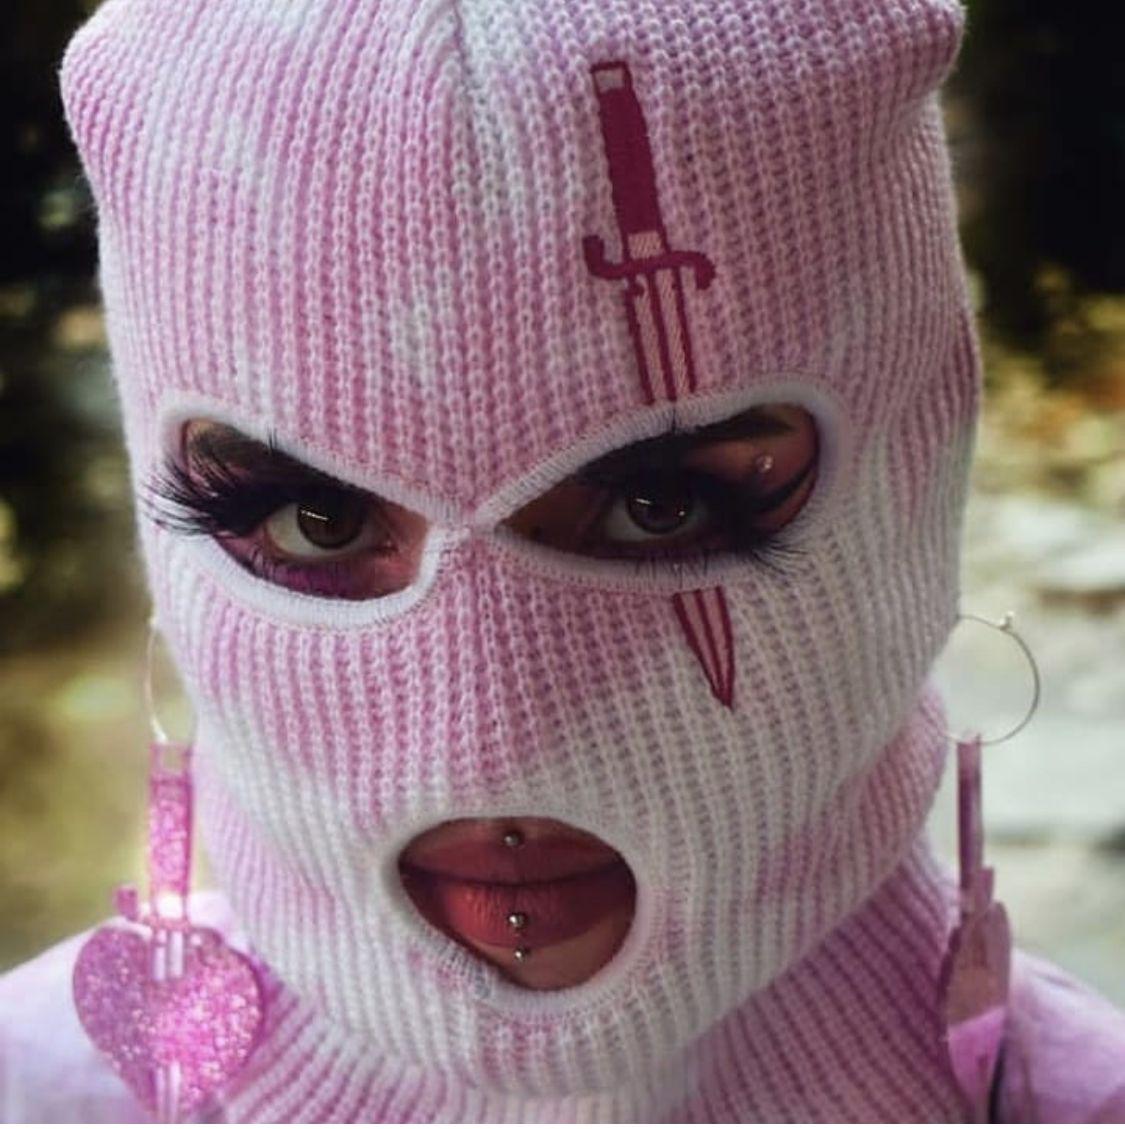 Baby Pink Ski Mask In 2020 Pink Halloween Costumes Baby Pink Ski Mask